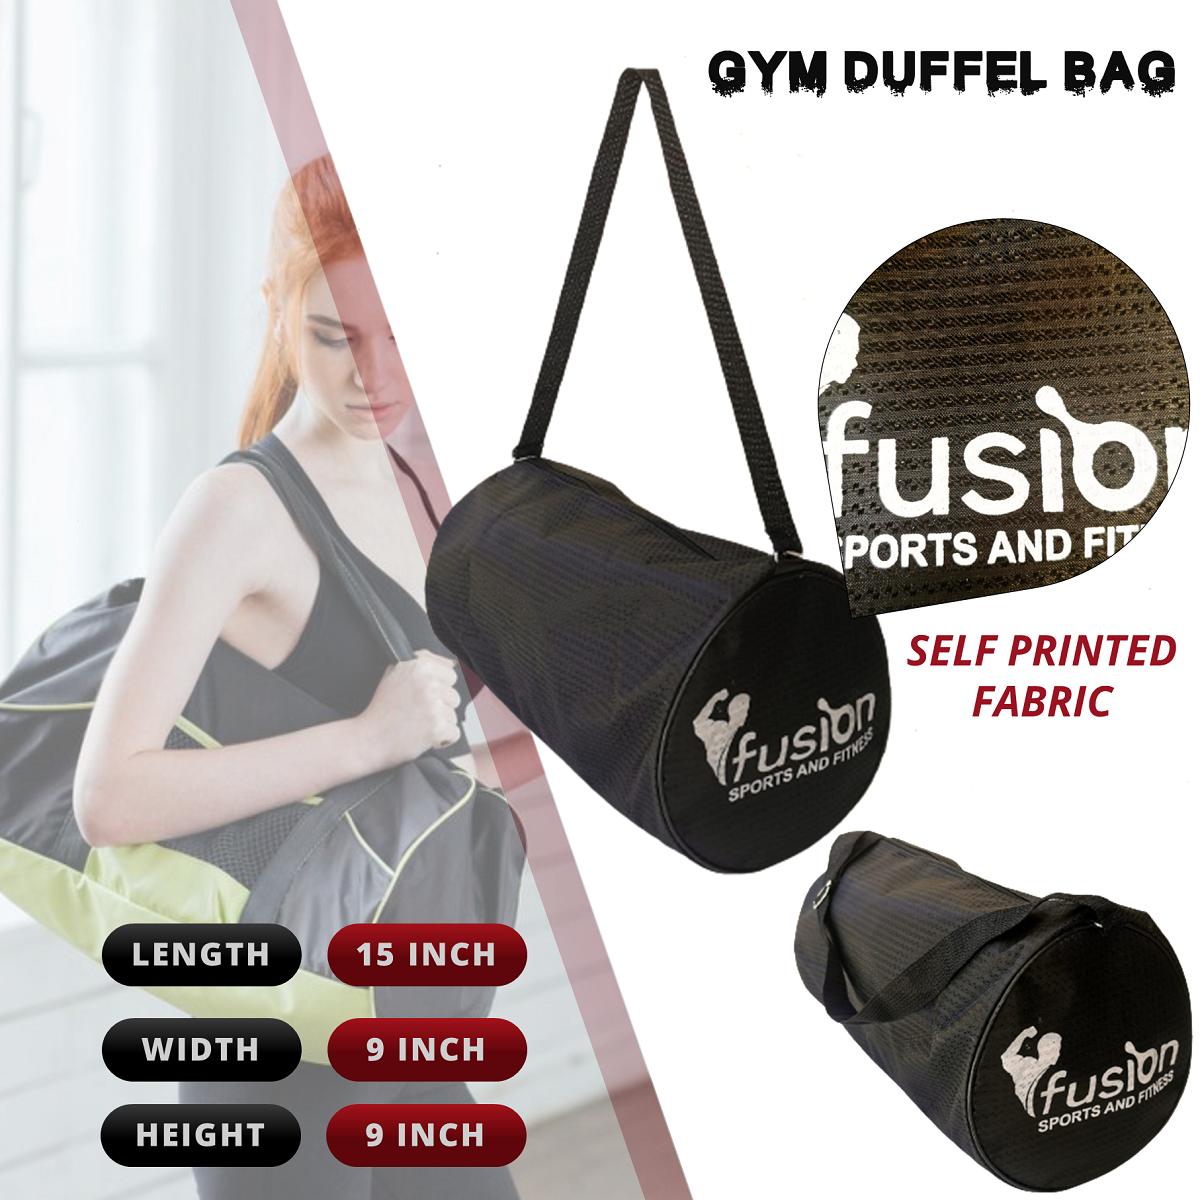 Gym Duffel Bag Sports Shoulder Bag Duffle Gym Training and Travel Bag